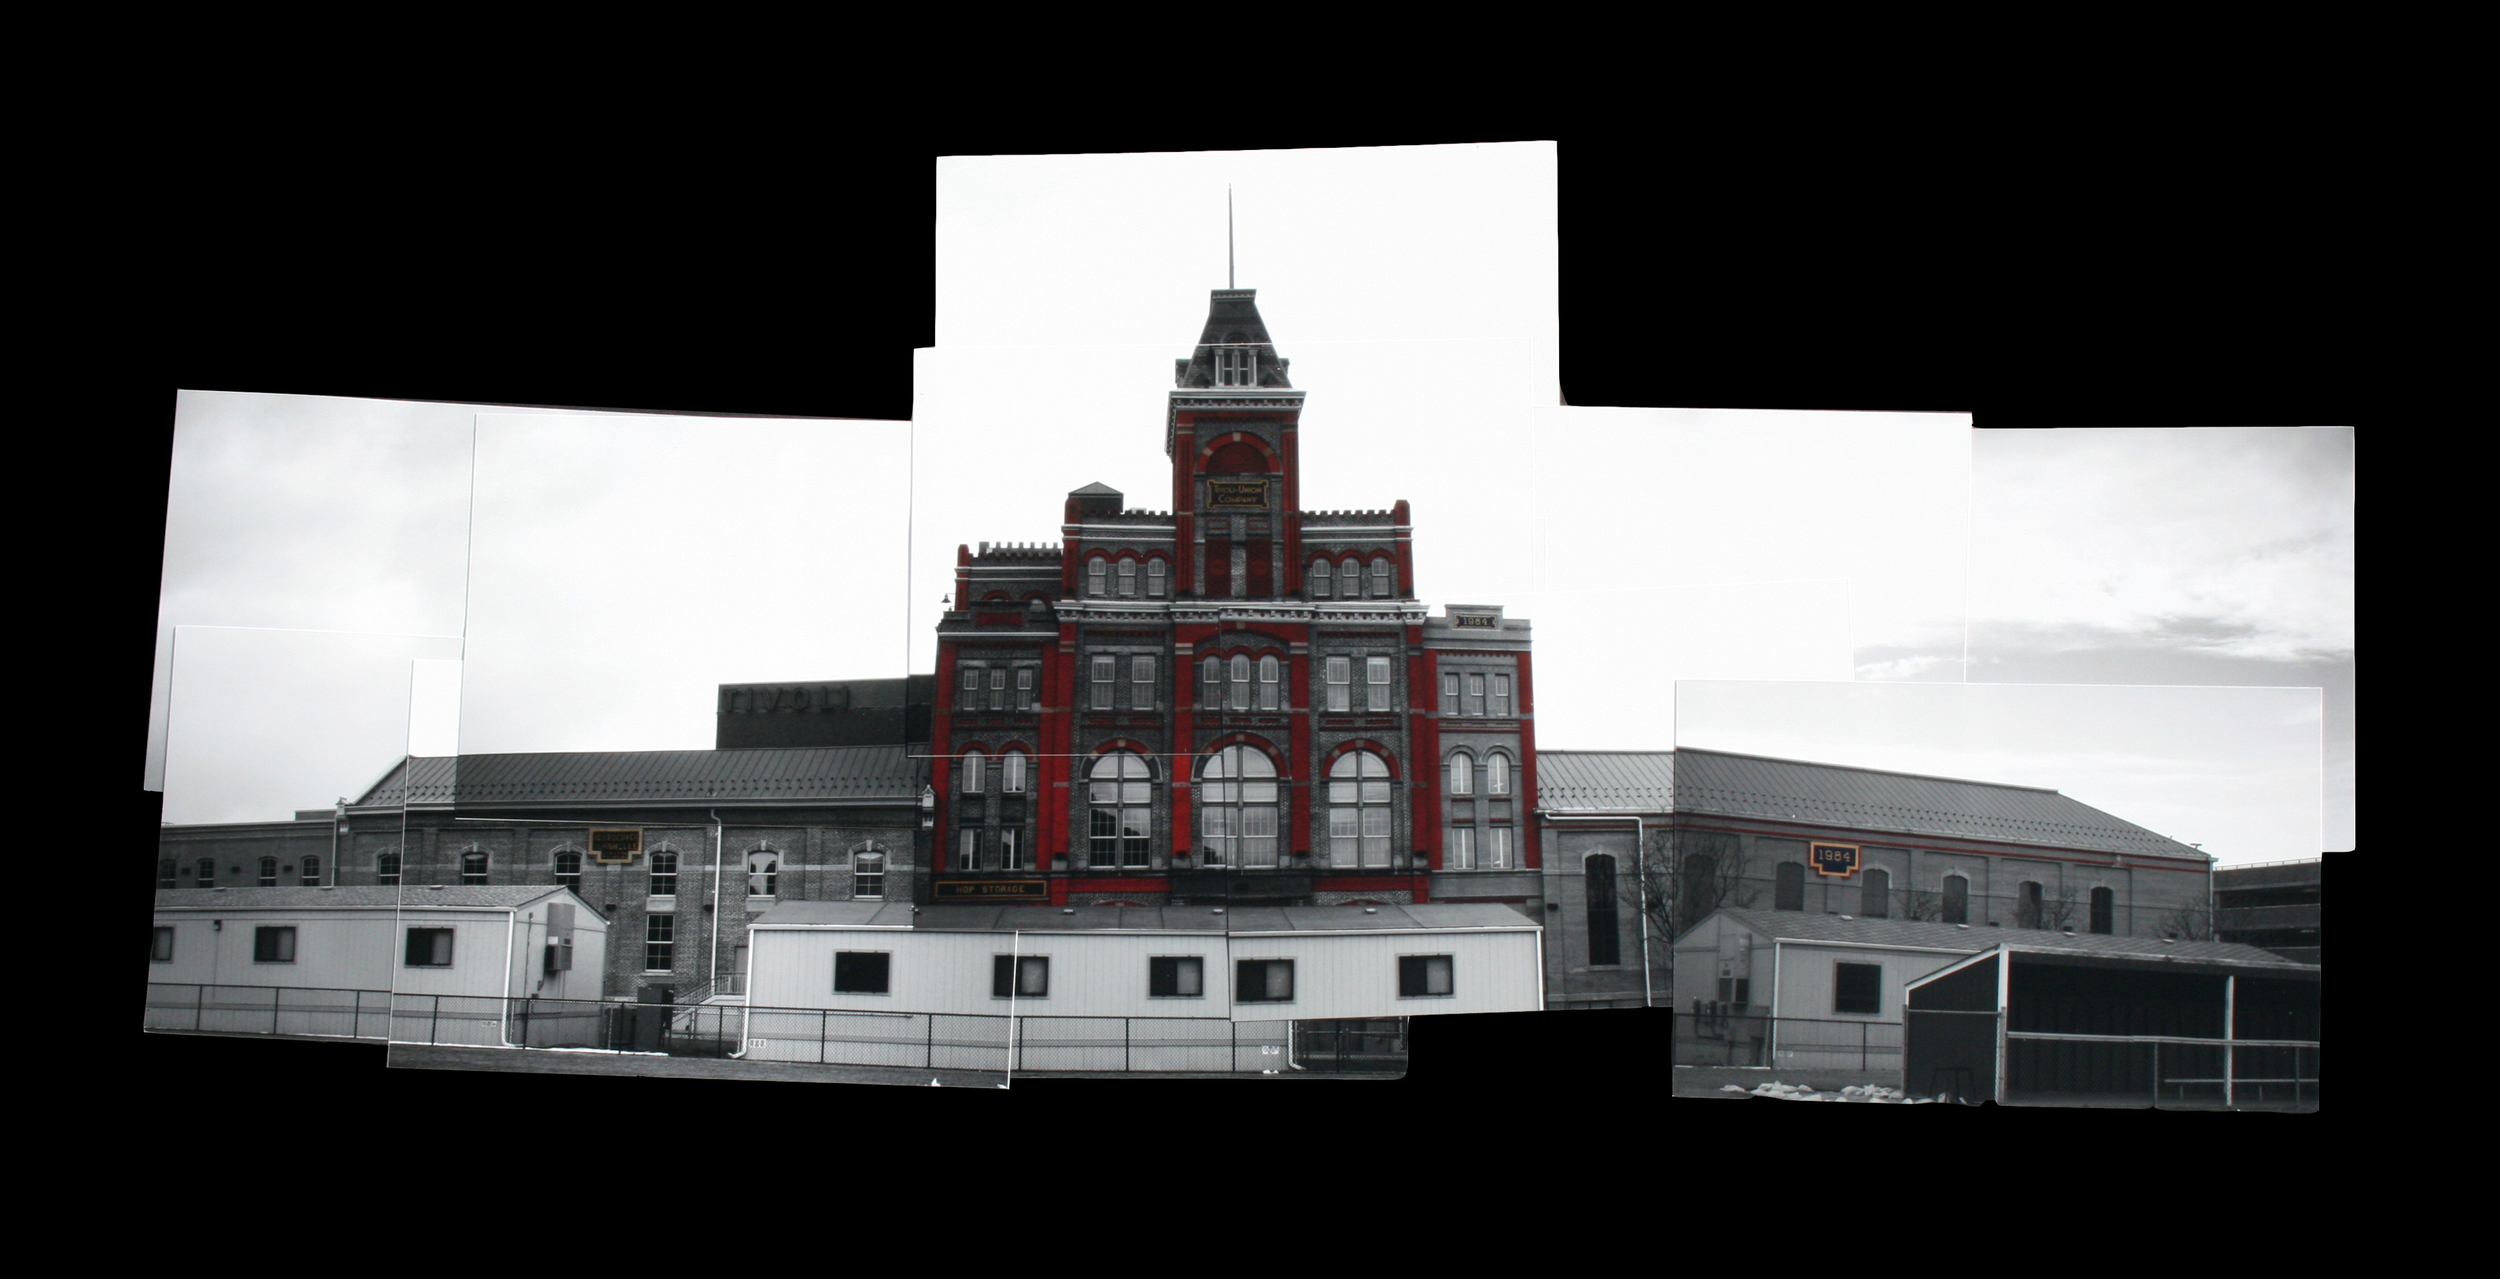 The Tivoli Brewery Building